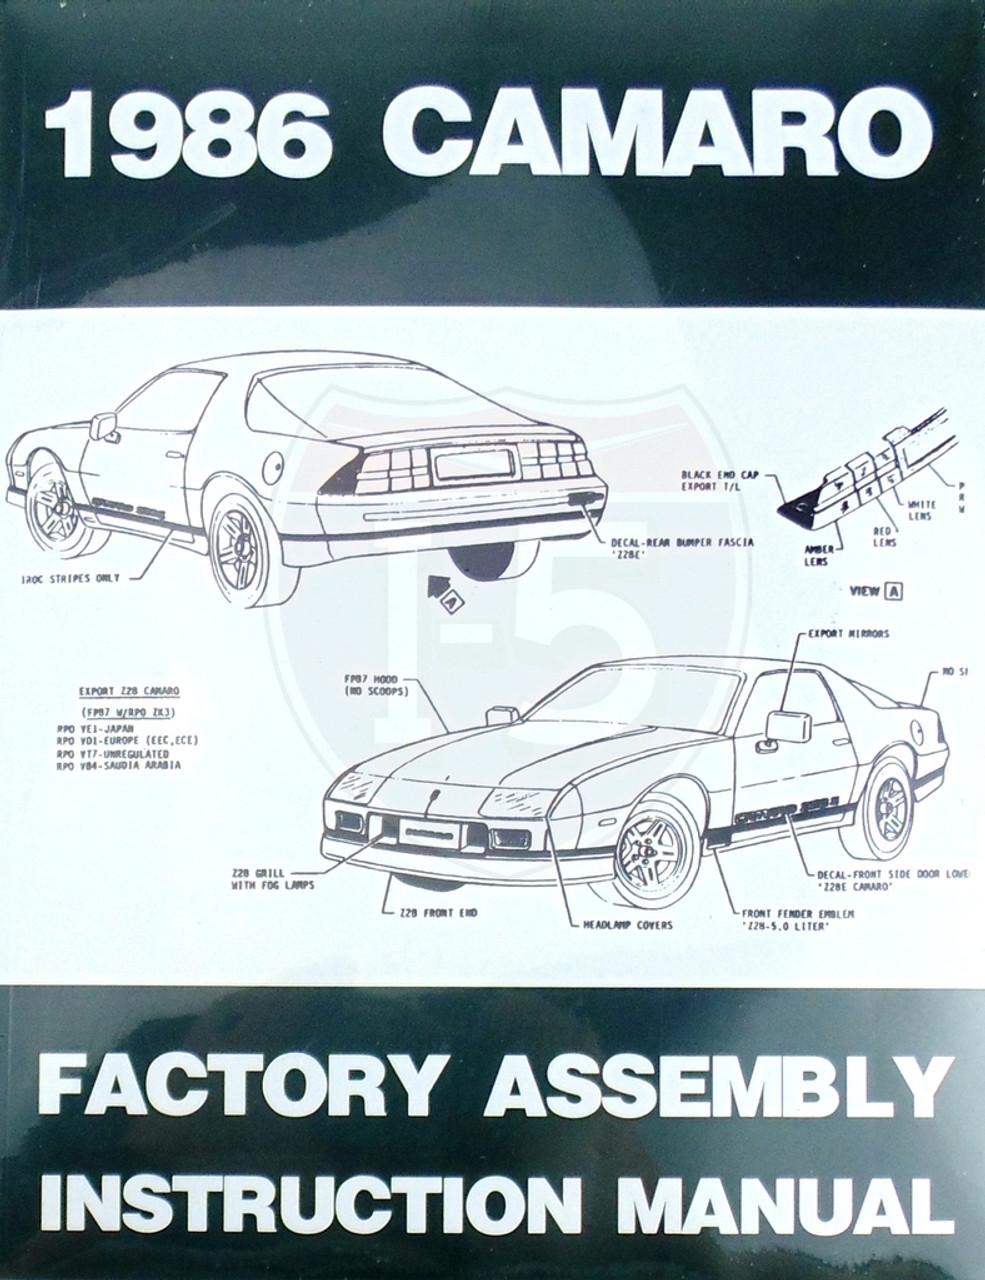 86 1986 chevy camaro factory assembly instruction manual guide book rh i5chevy com 1986 camaro assembly manual pdf 1968 camaro assembly manual pictures